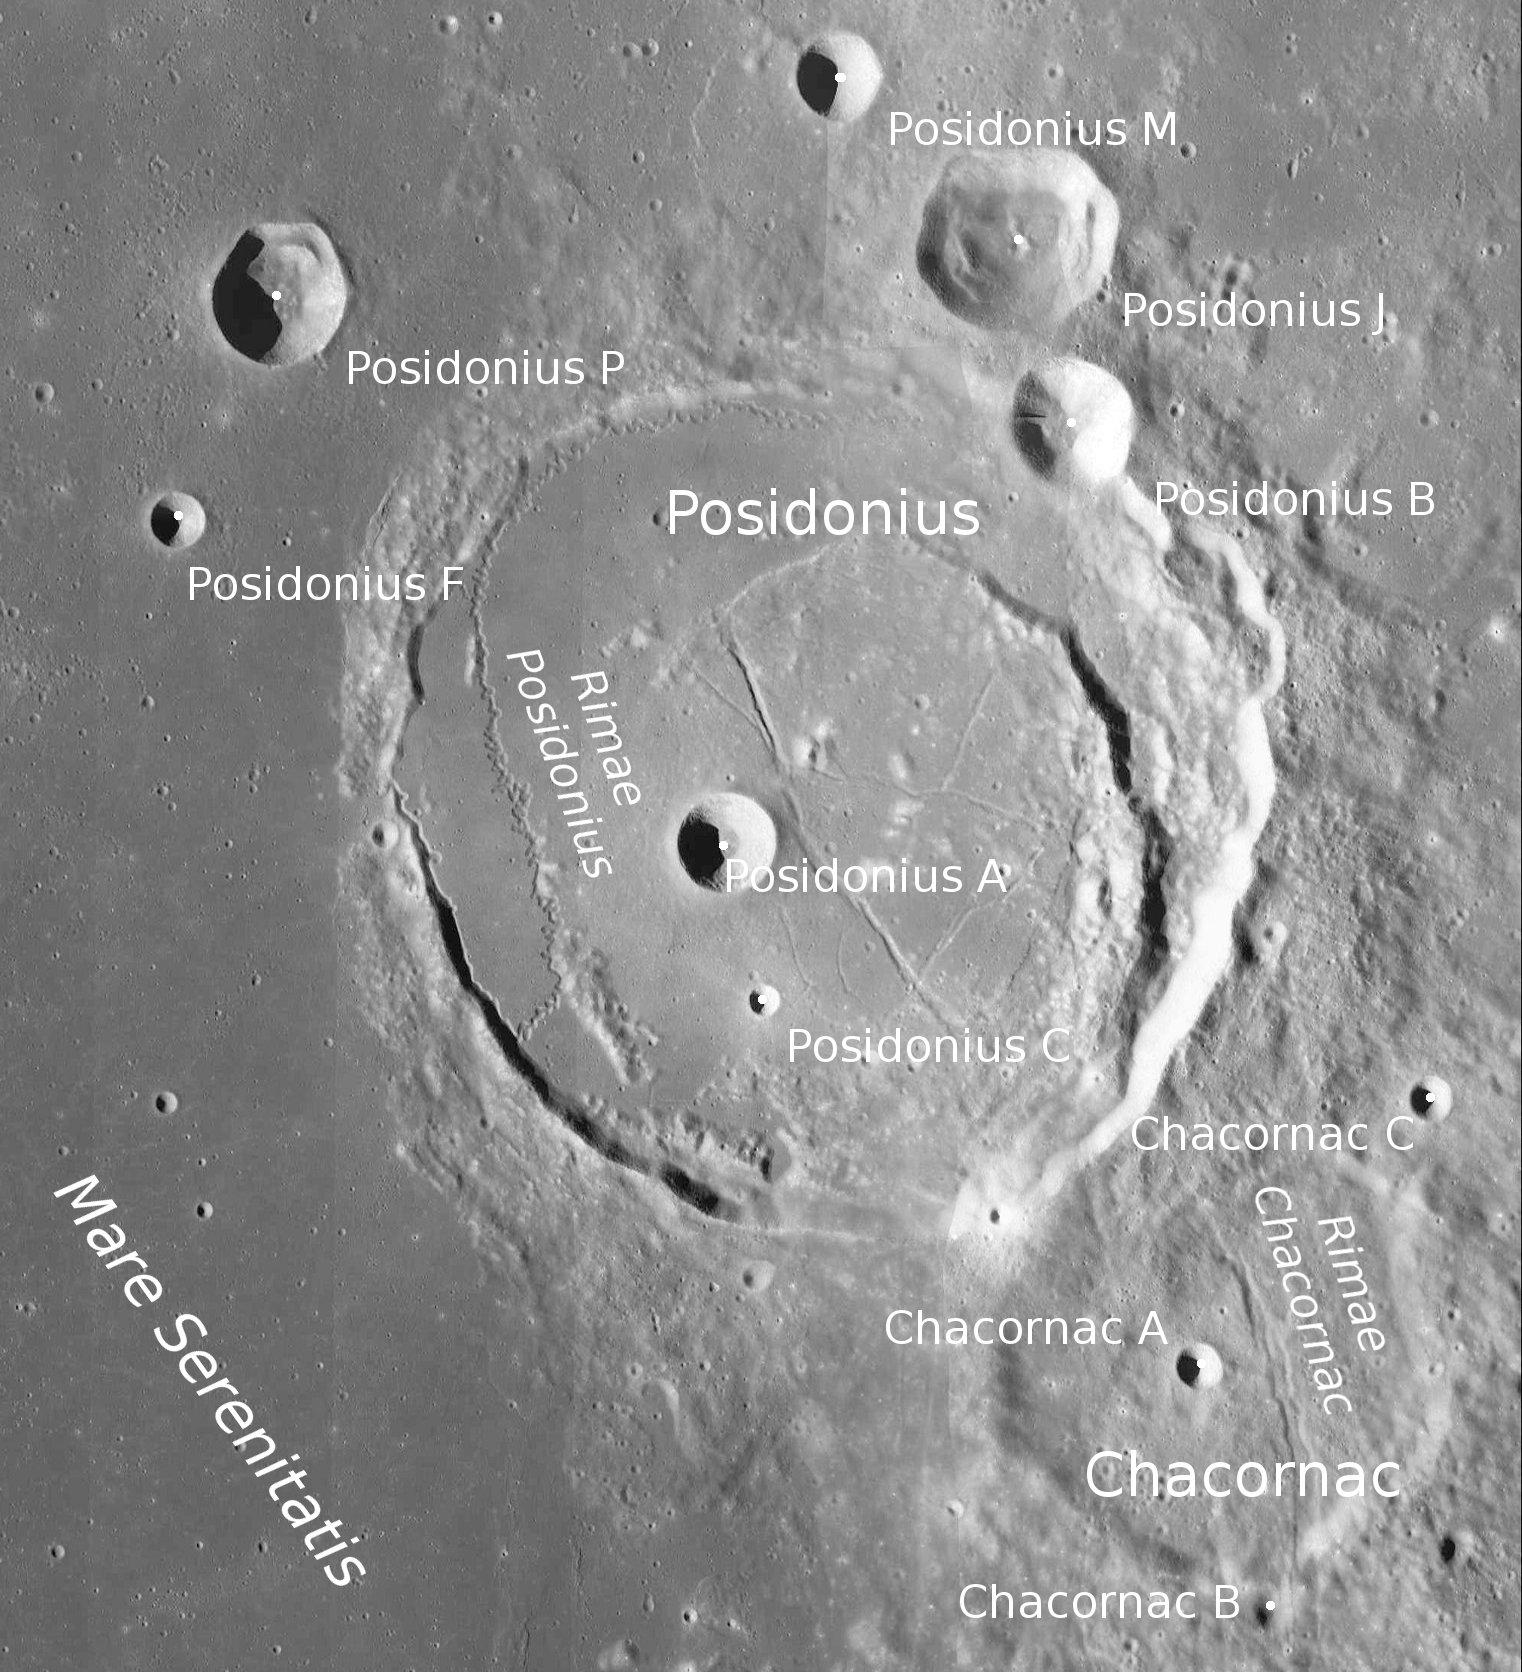 Posidonius Rimae - Image LRO